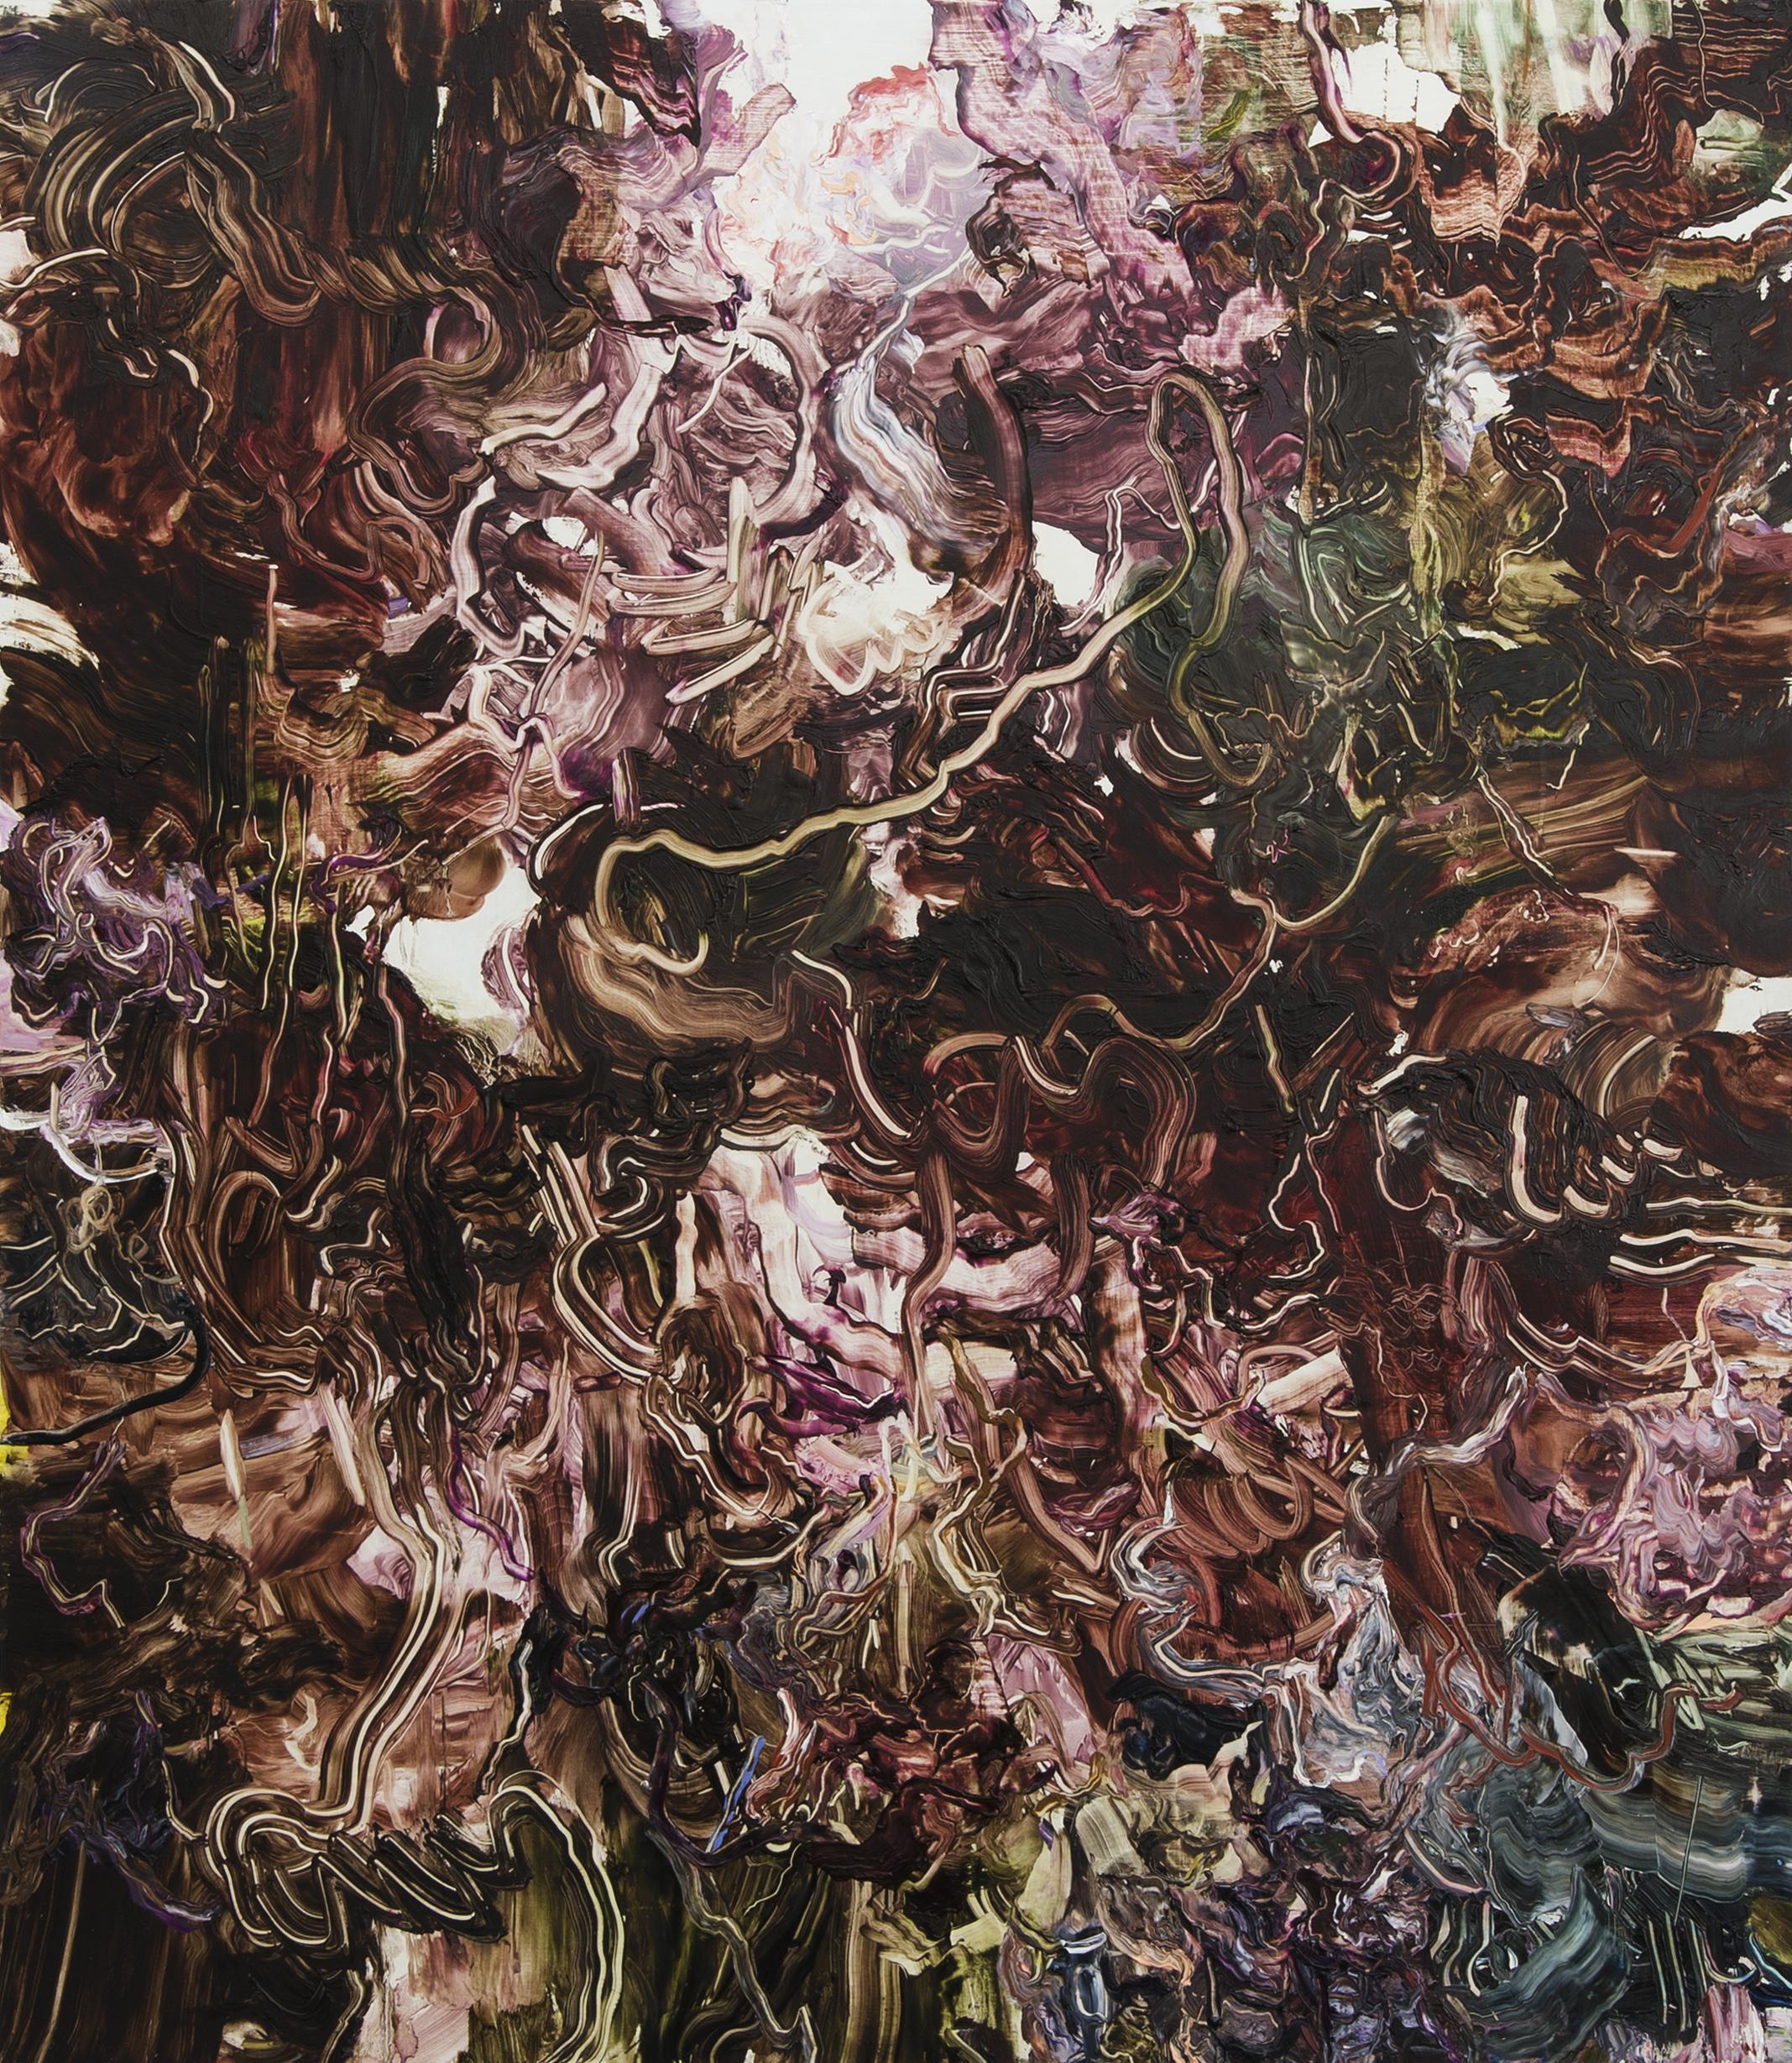 Christina Ekstrand, Meander: Mor Myr Mur, olja pa duk, 115x100 cm, 2019